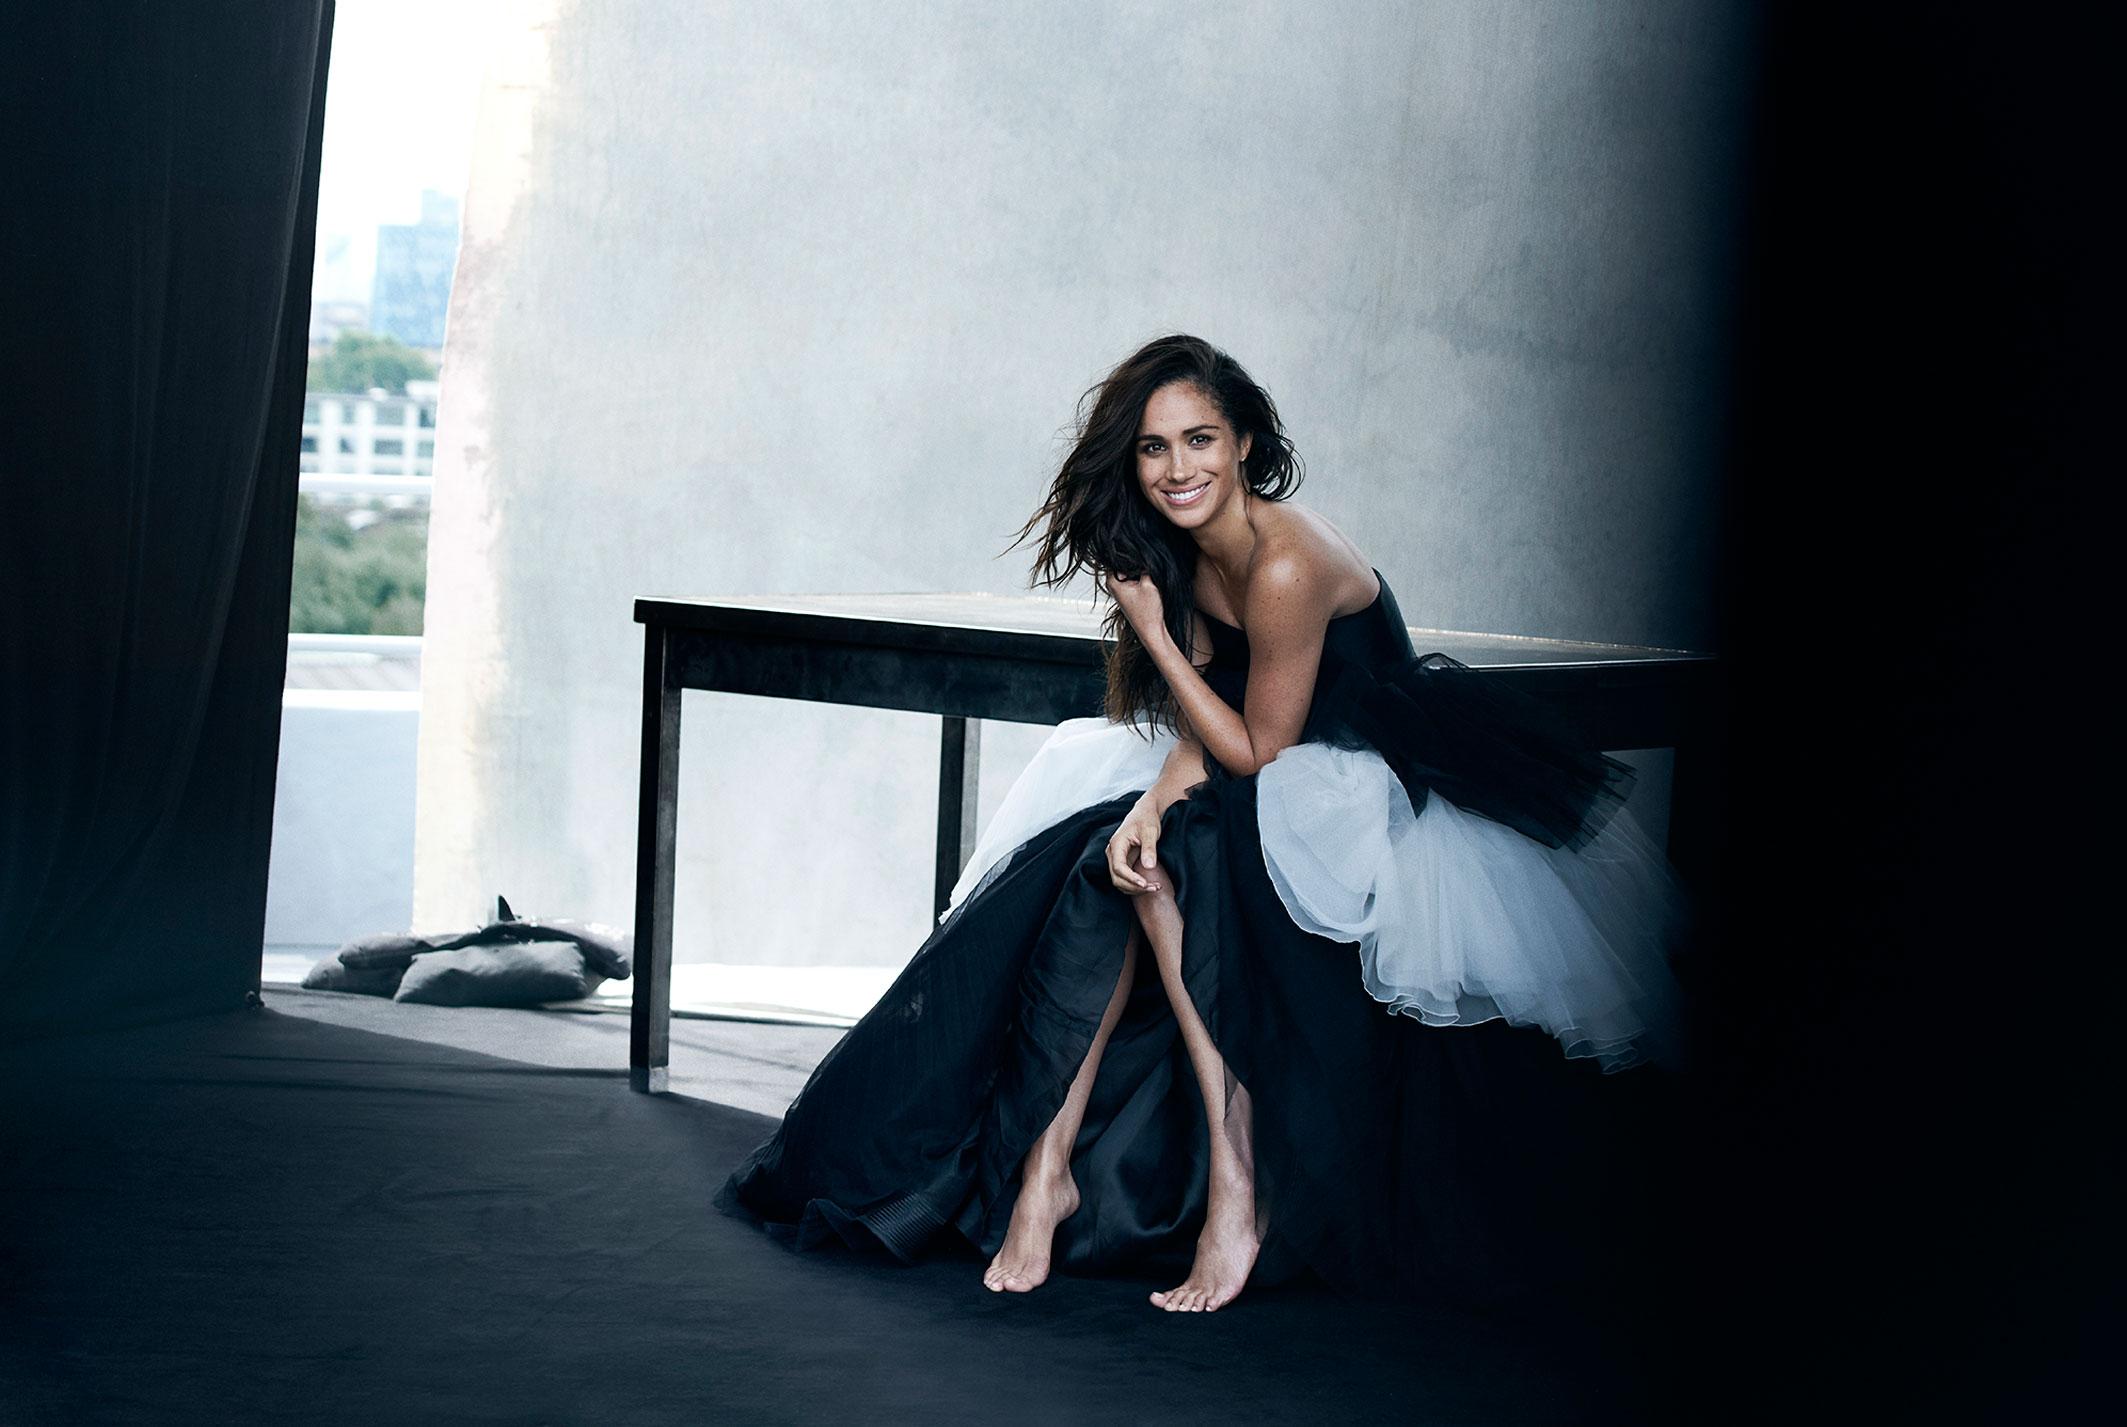 Меган Маркл на страницах журнала Vanity Fair / фото 03